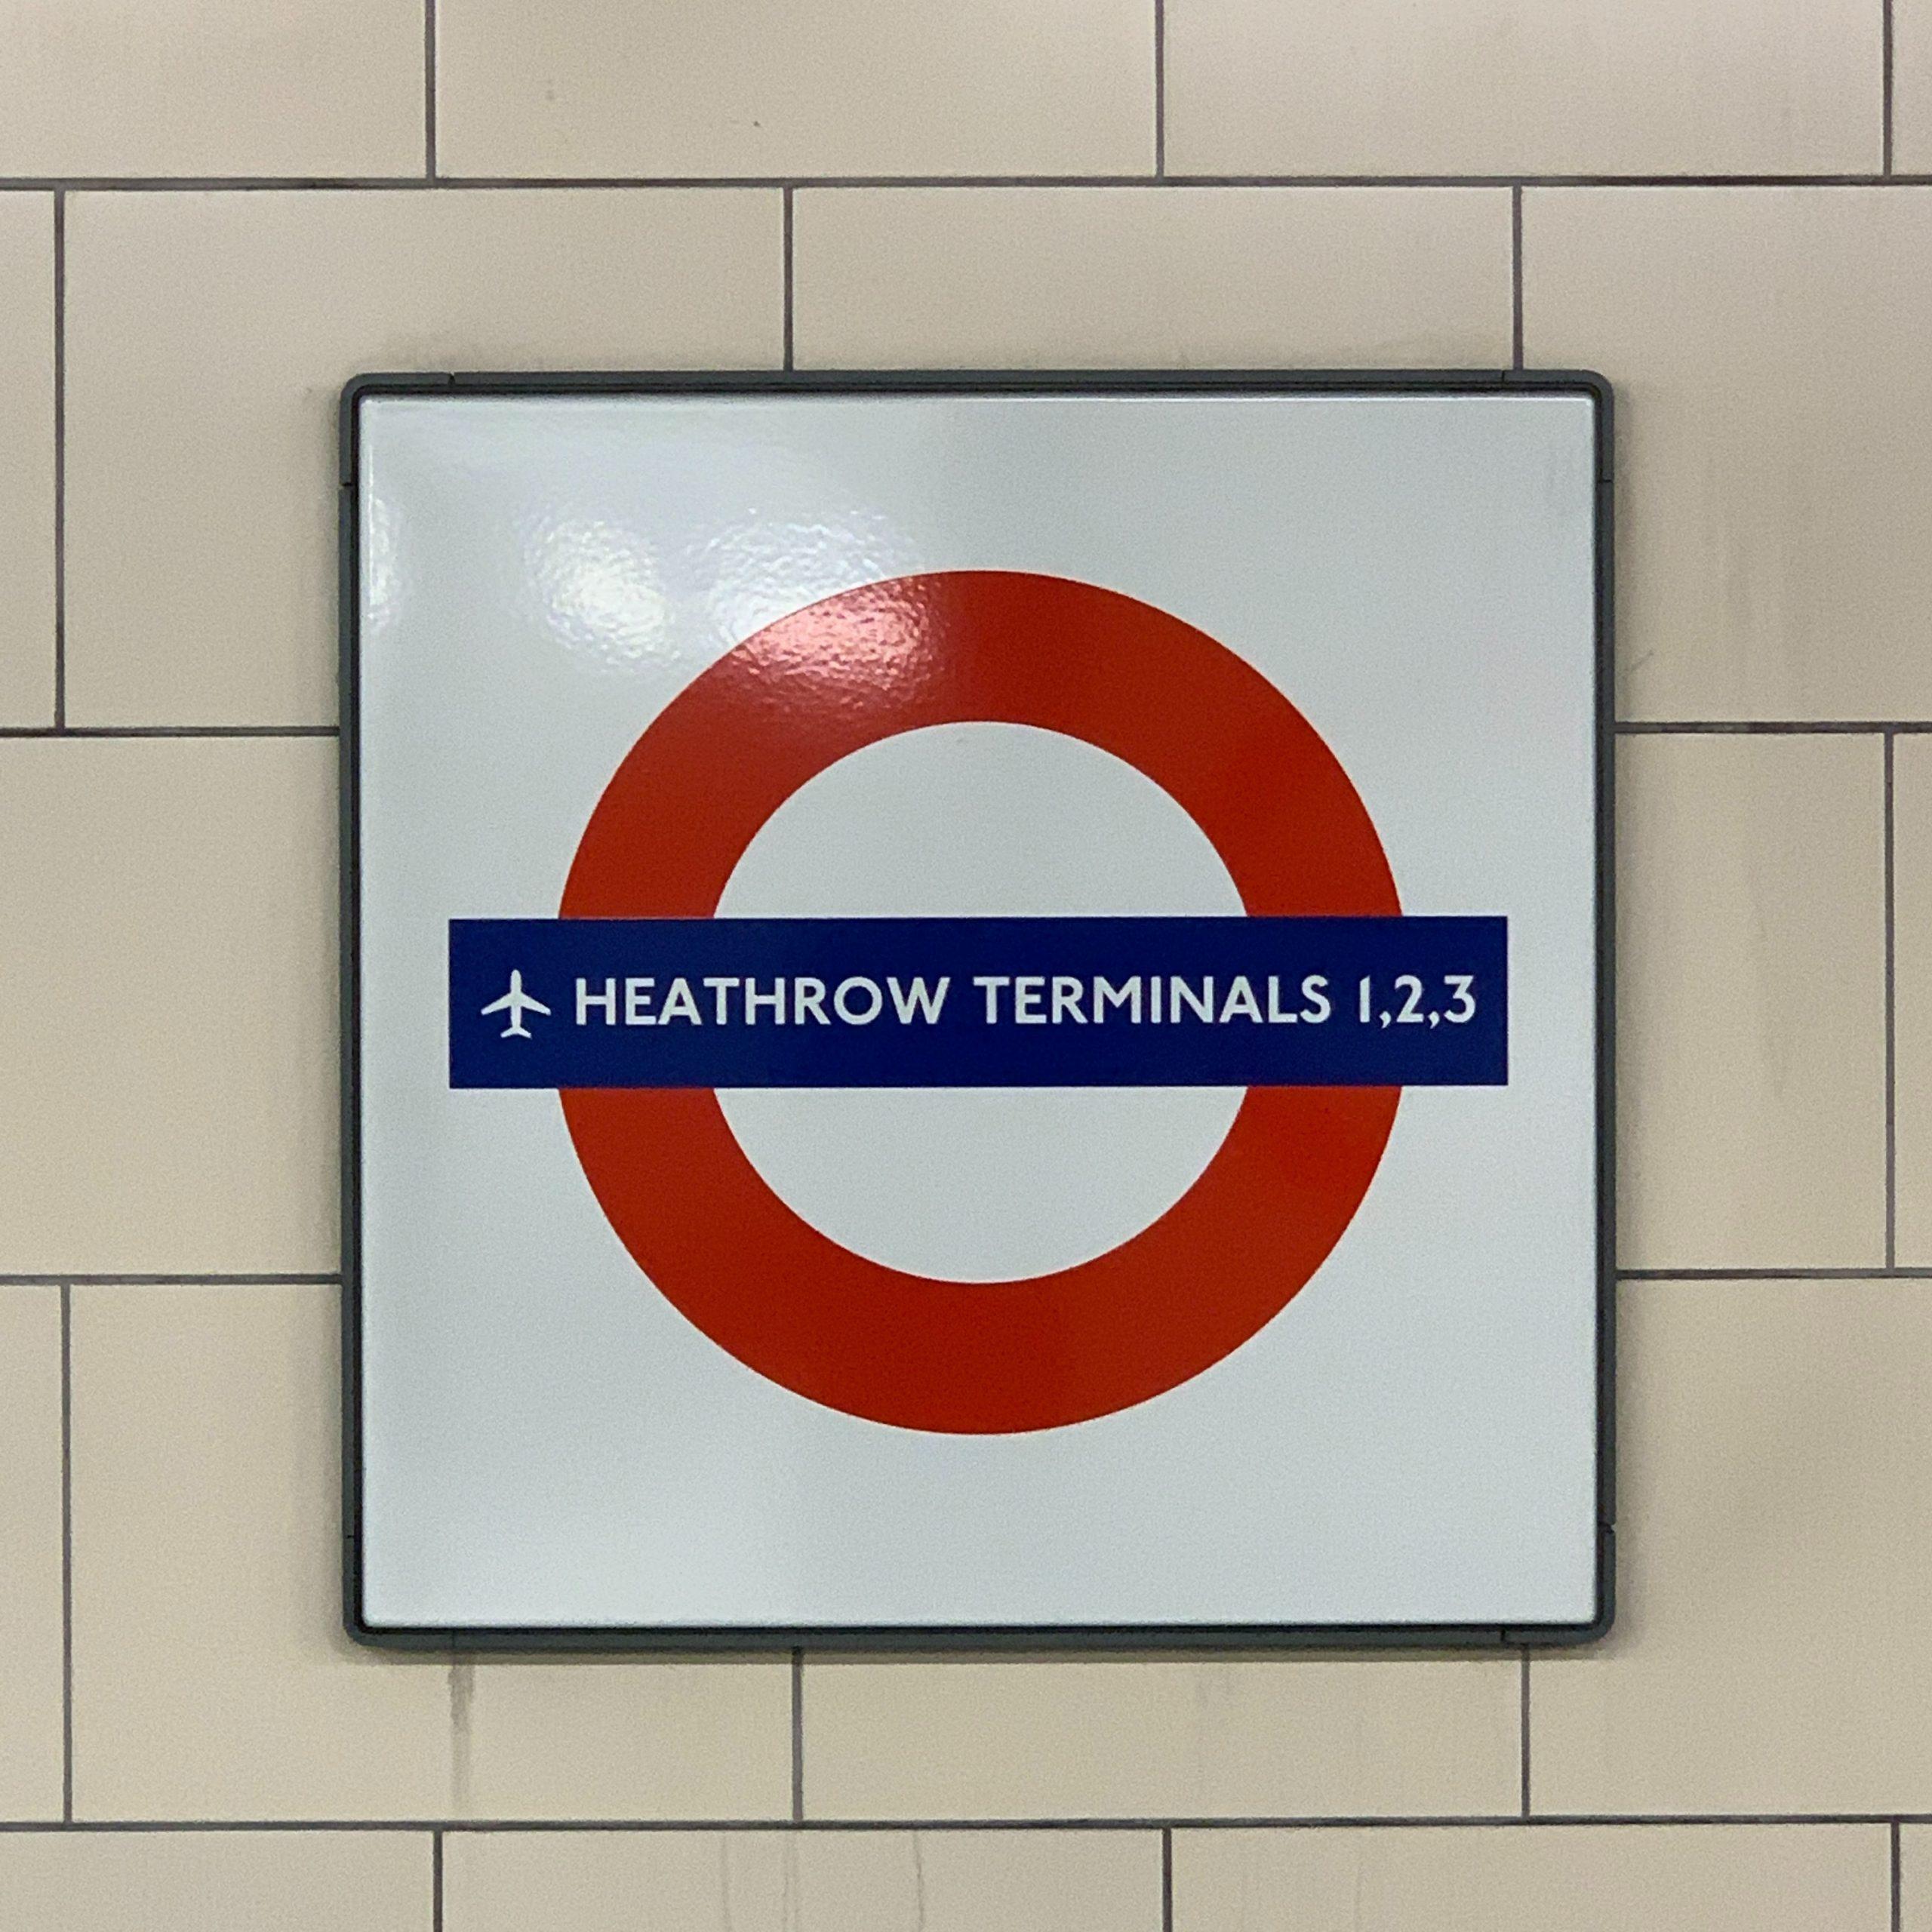 Heathrow Airport via the London Underground